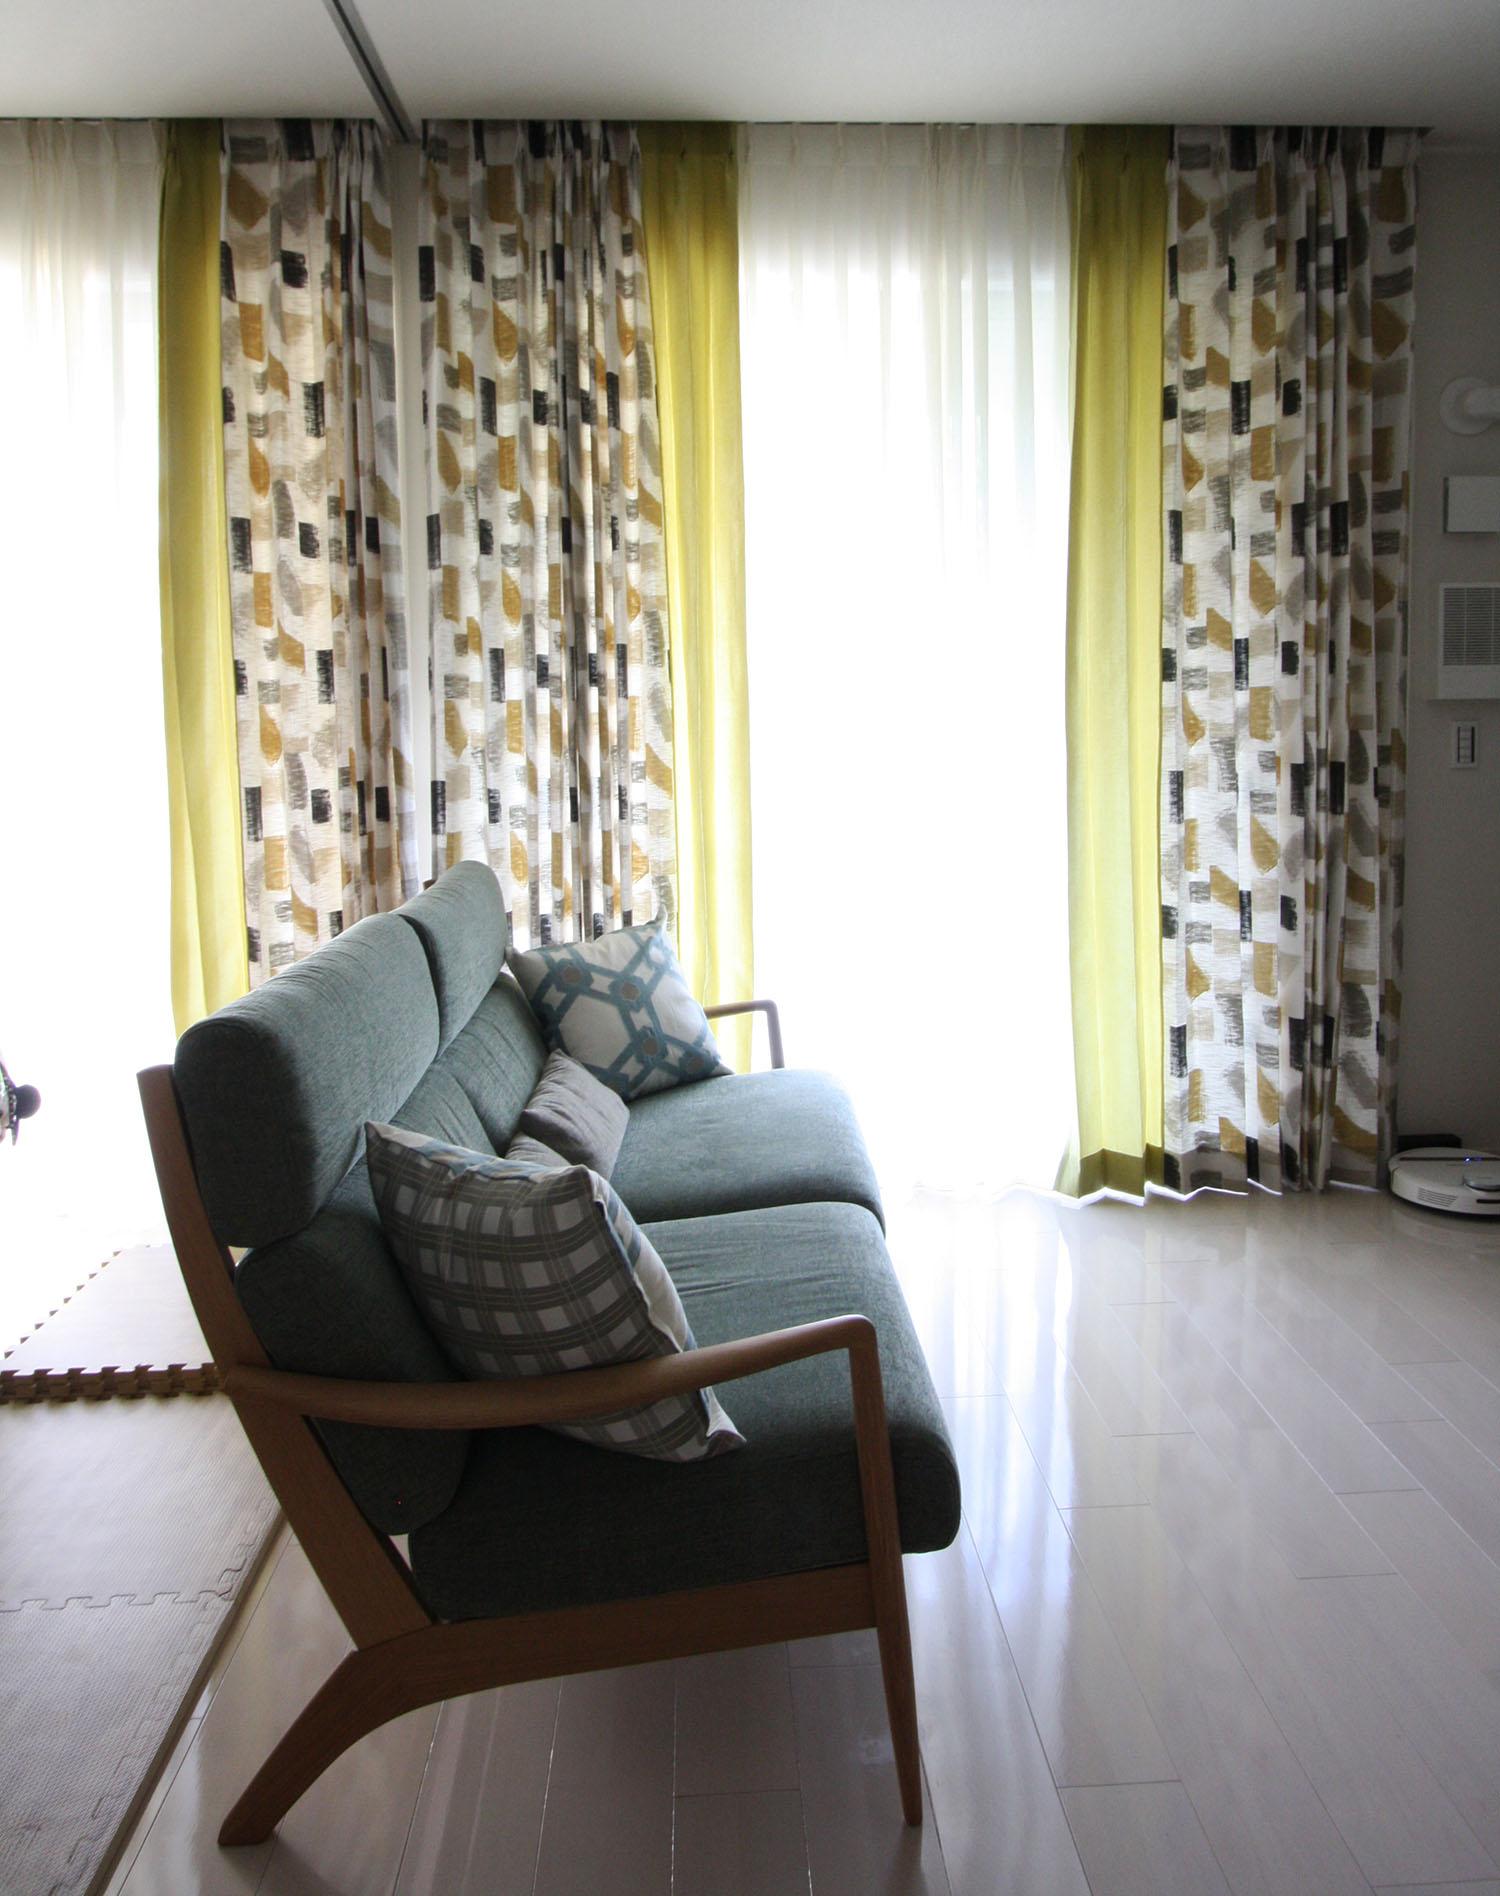 Villa Novaのカーテンとテシードの輸入壁紙とエコカラットタイルと黒板